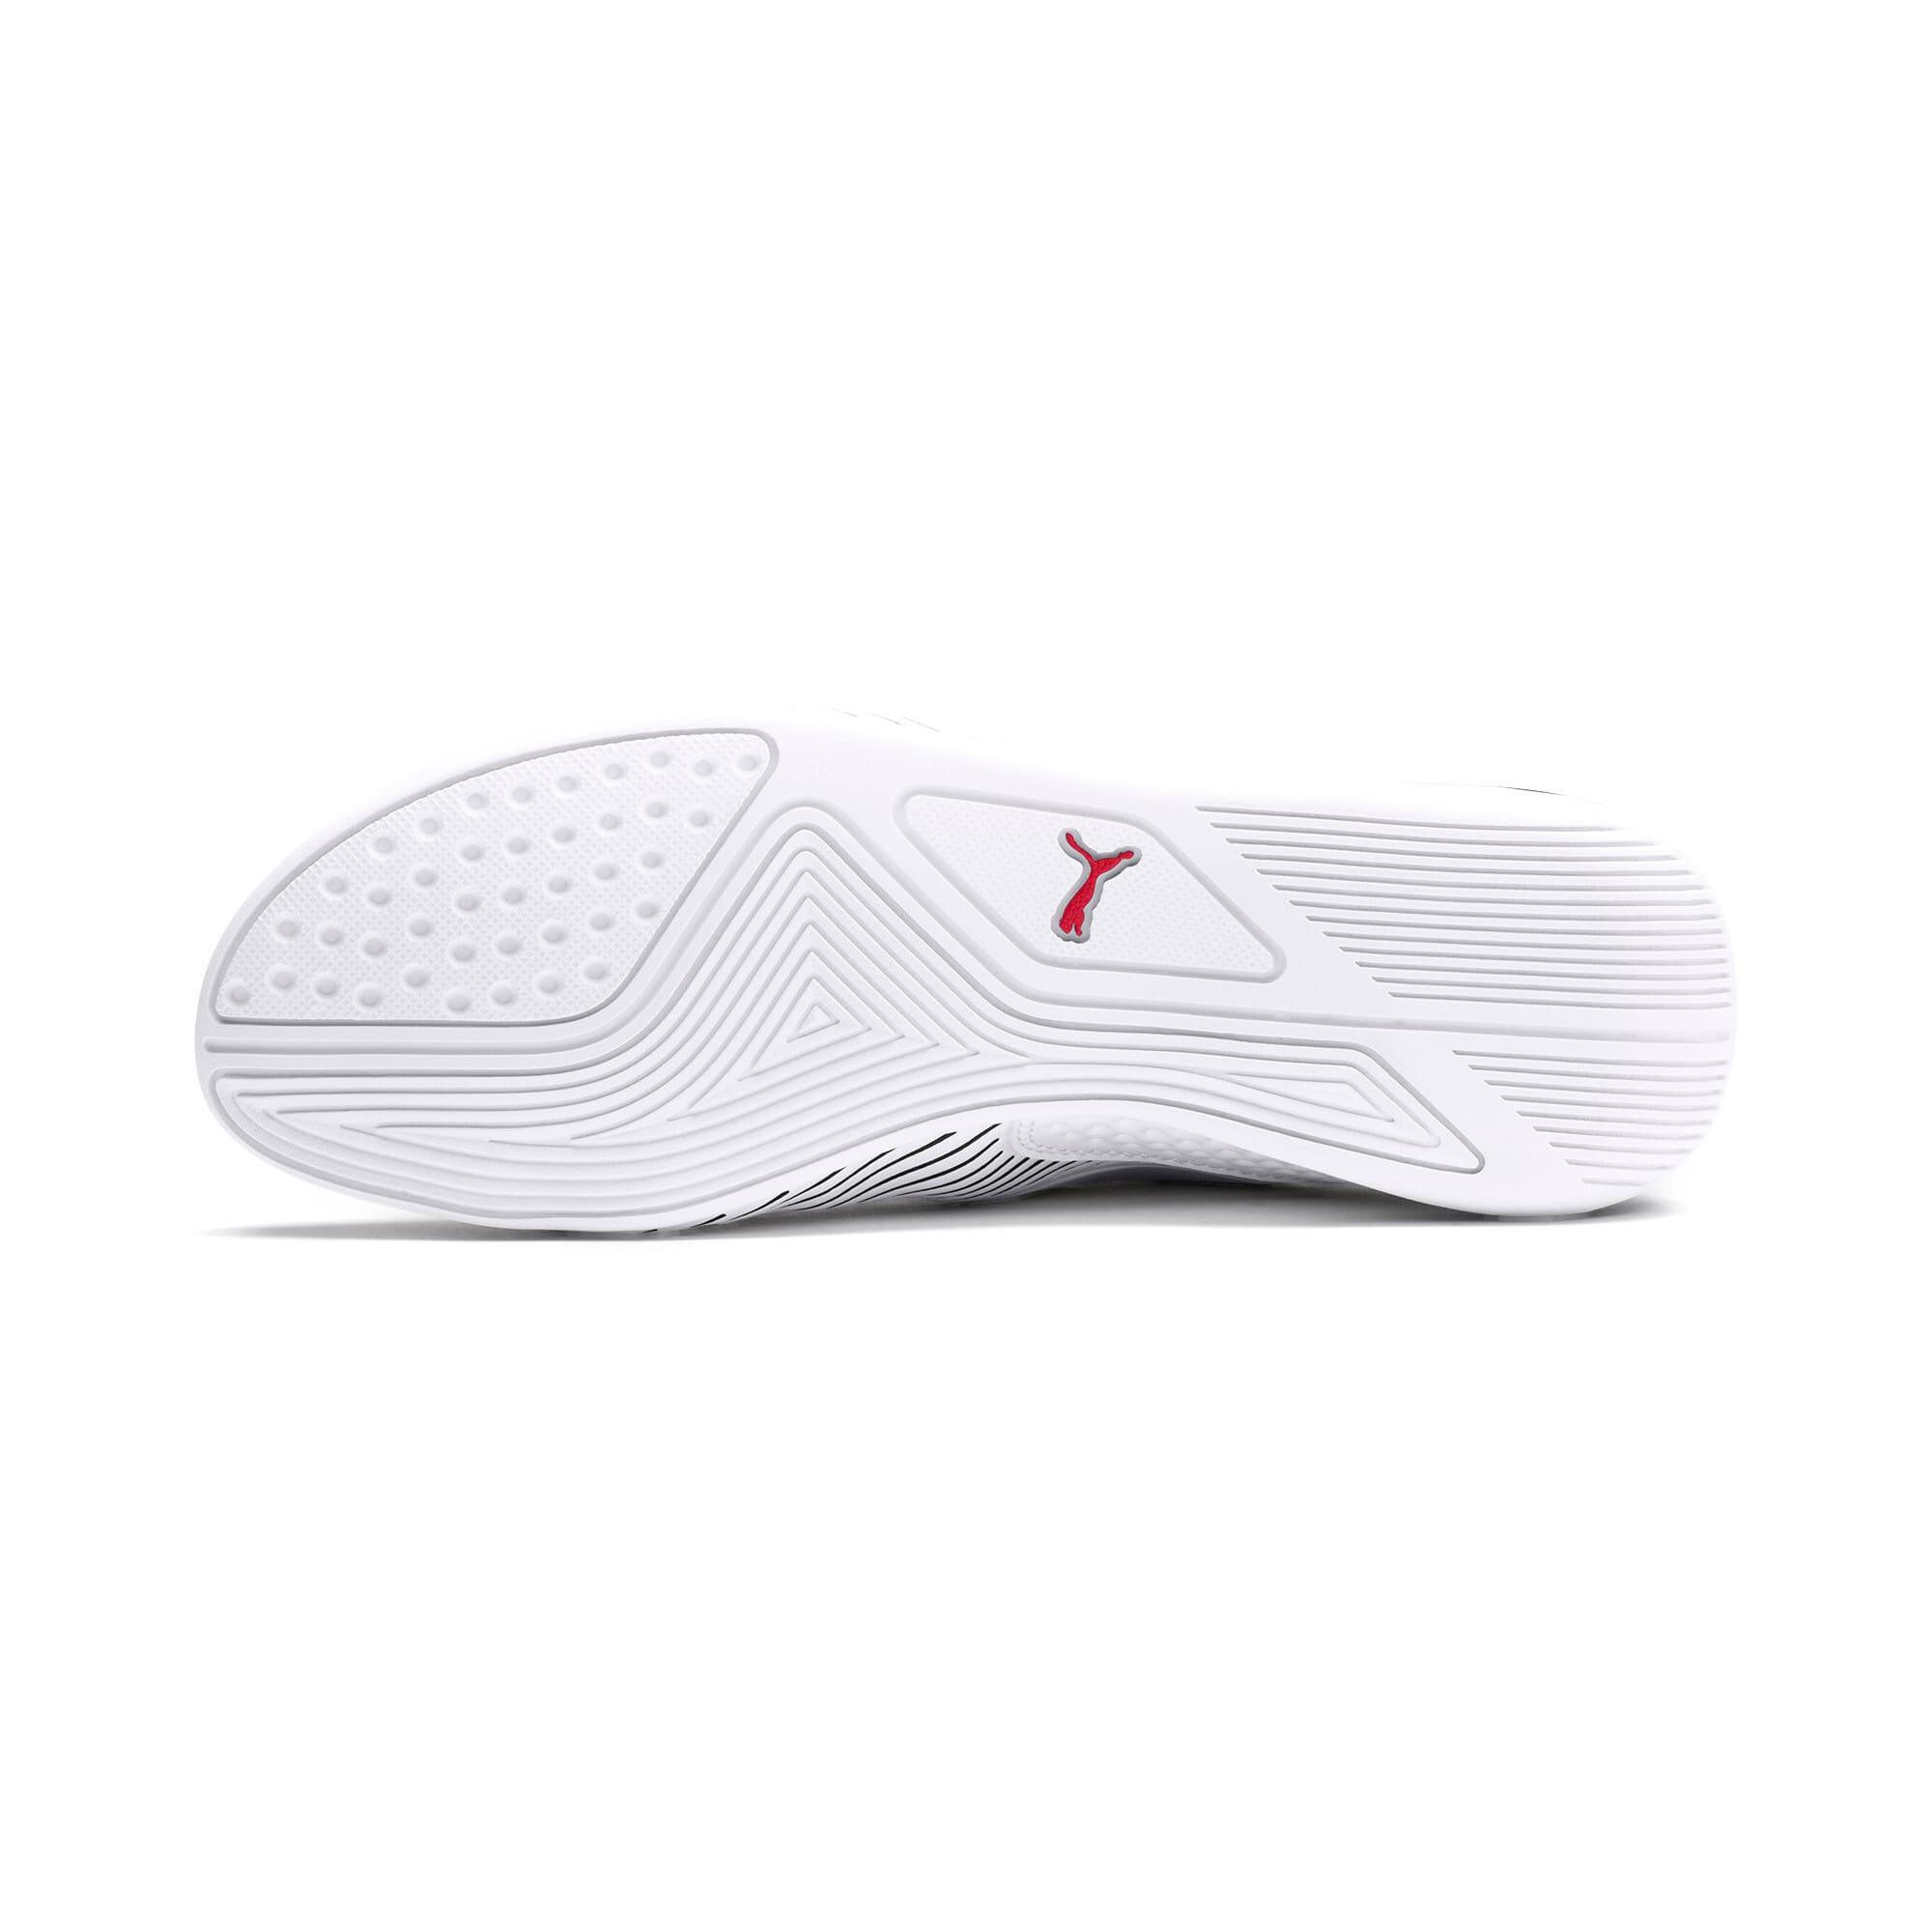 Thumbnail 4 of Scuderia Ferrari Drift Cat 7S Ultra Shoes JR, Puma White-Puma Black, medium